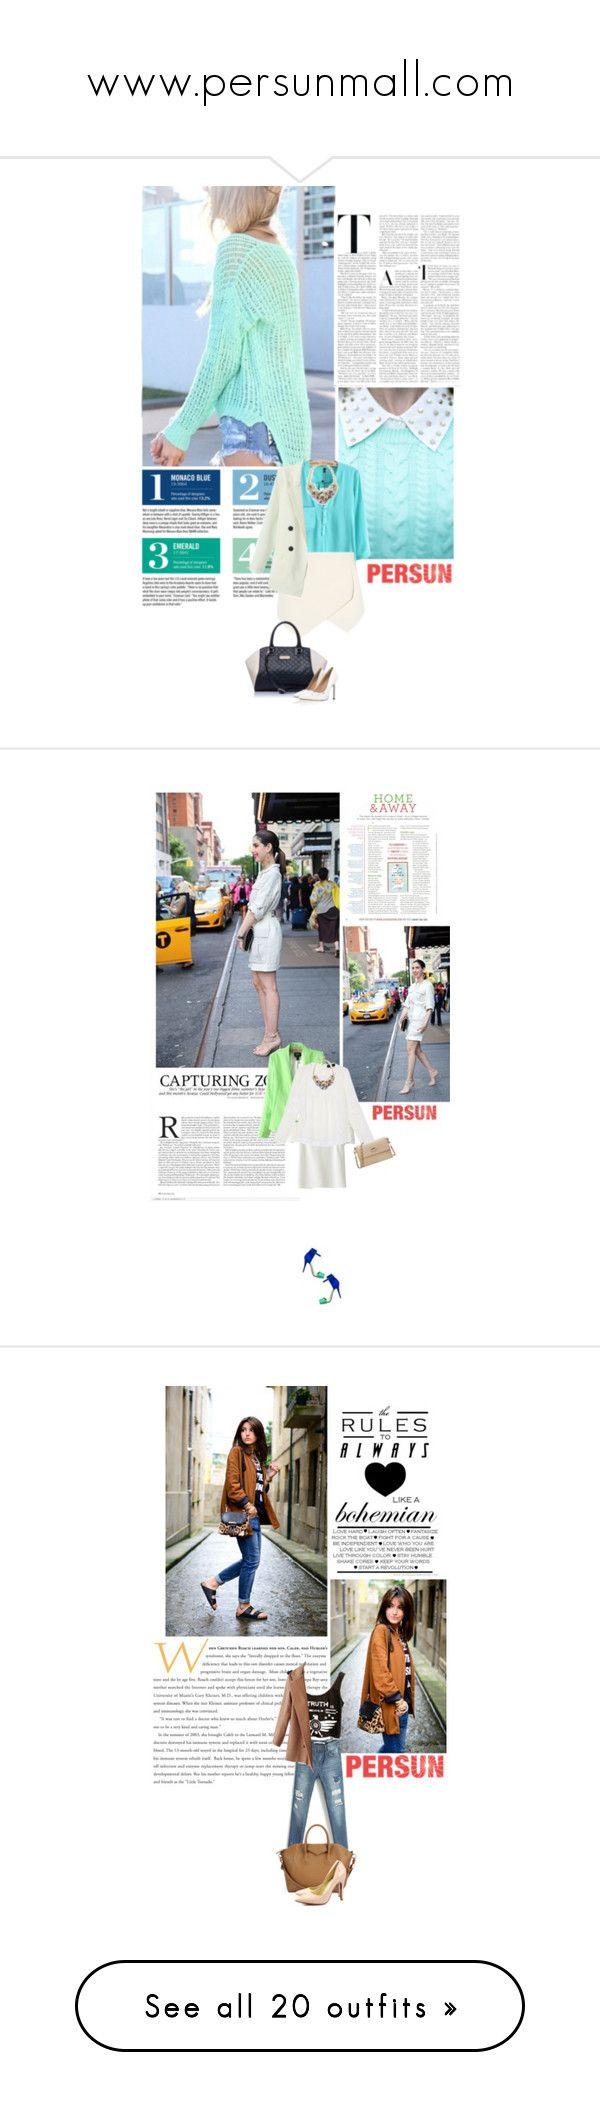 """www.persunmall.com"" by kristina779 ❤ liked on Polyvore featuring Garance Doré, Garotas, Retrò, Williams-Sonoma, Ava & Aiden, Zara, Elizabeth and James, ASOS, Paige Denim and Sonam Life"